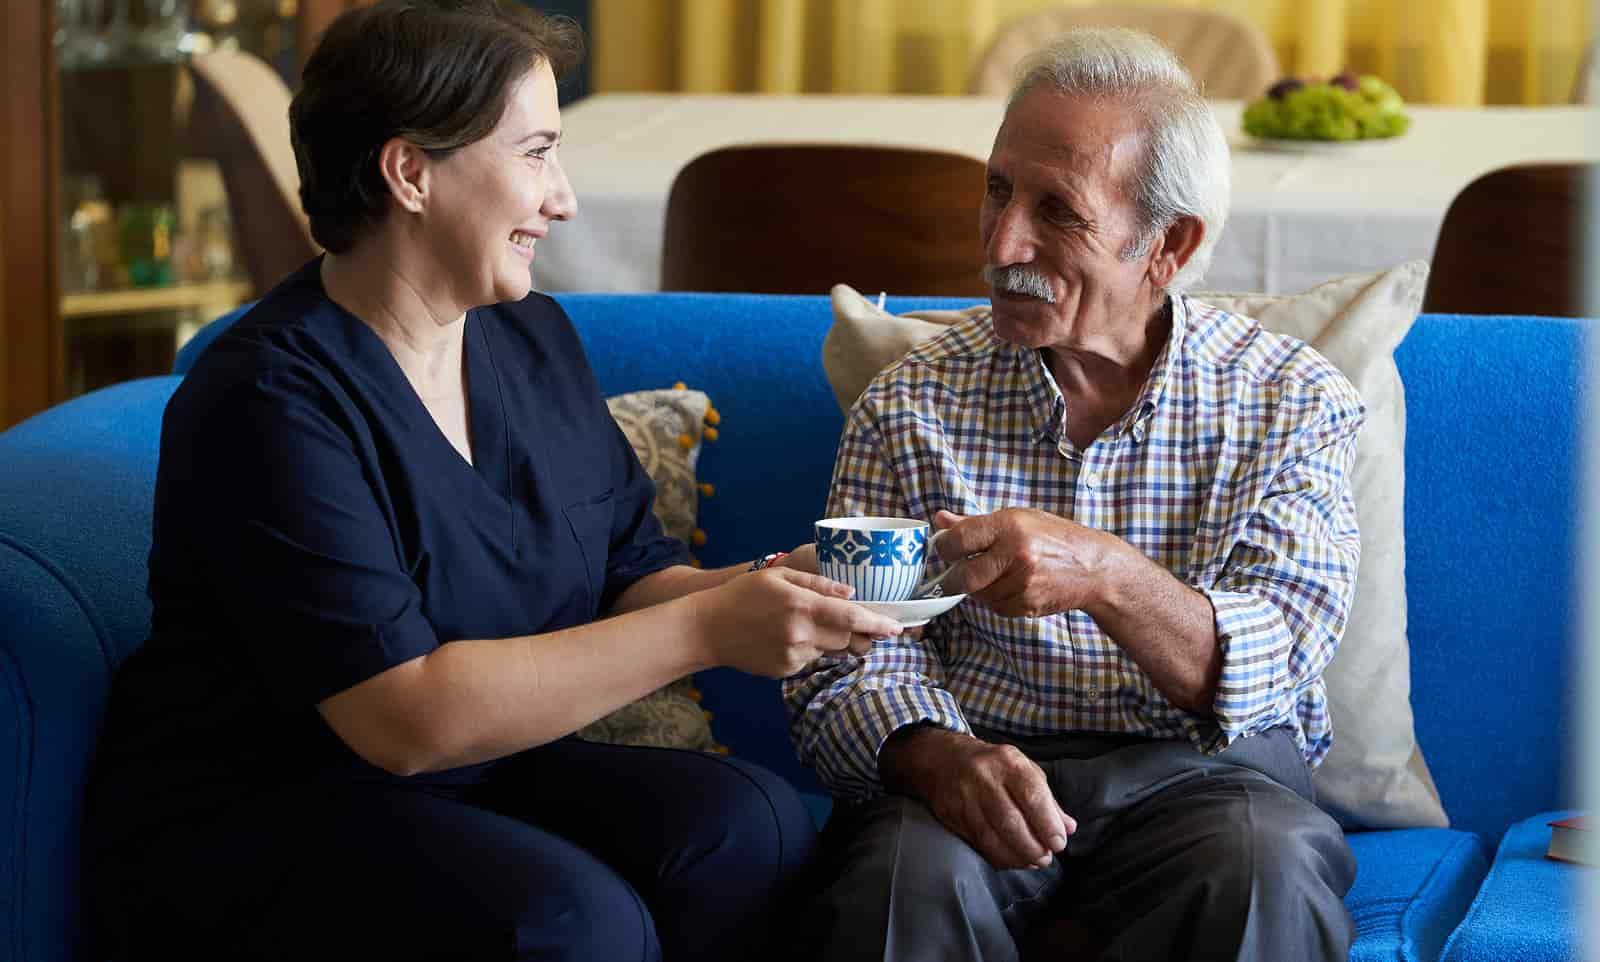 caregiver with dementia patient